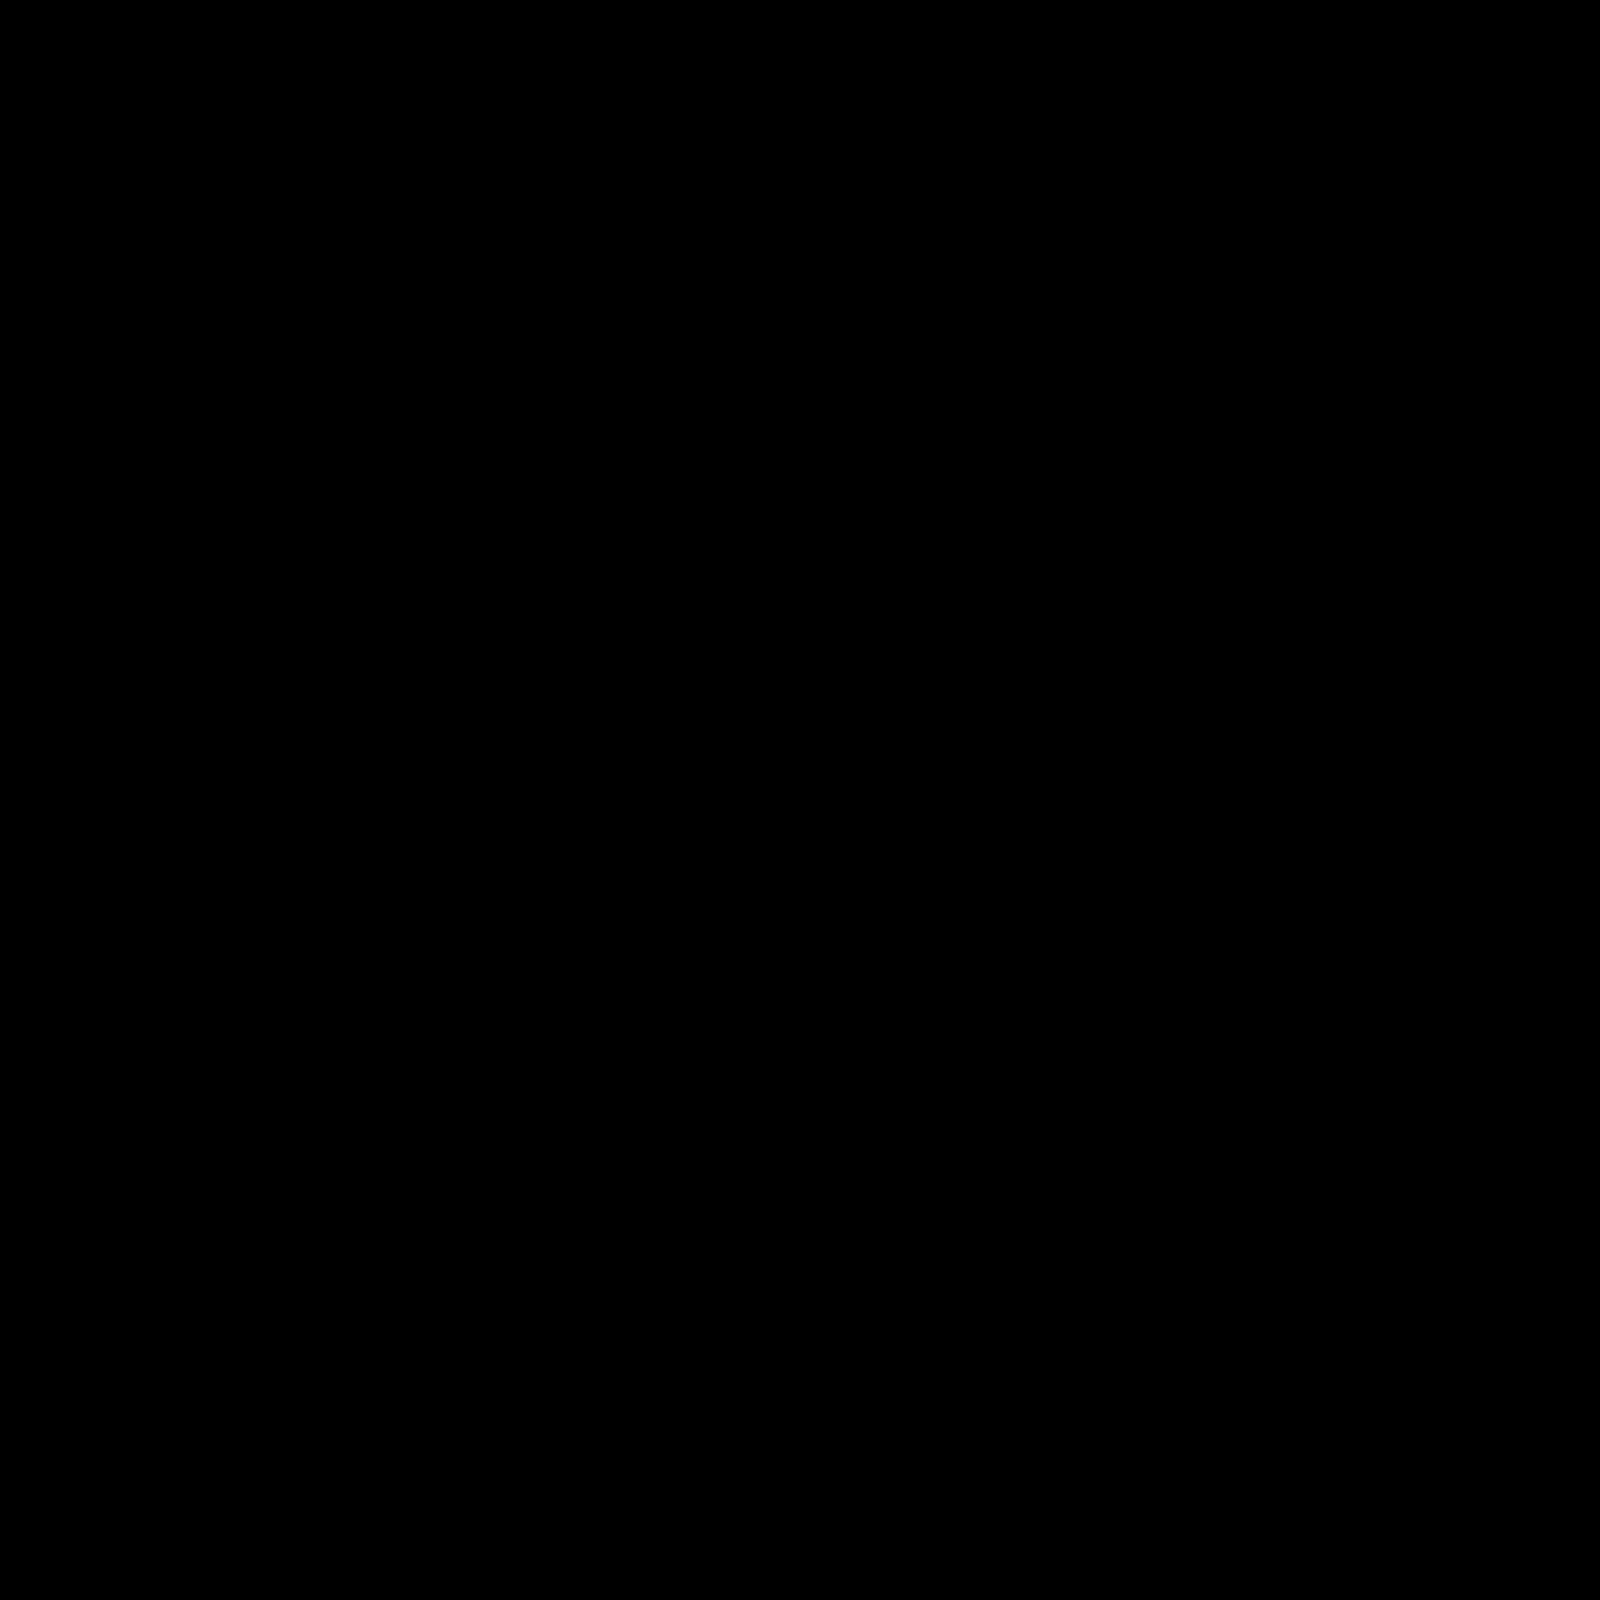 1600x1600 Meditation Icon